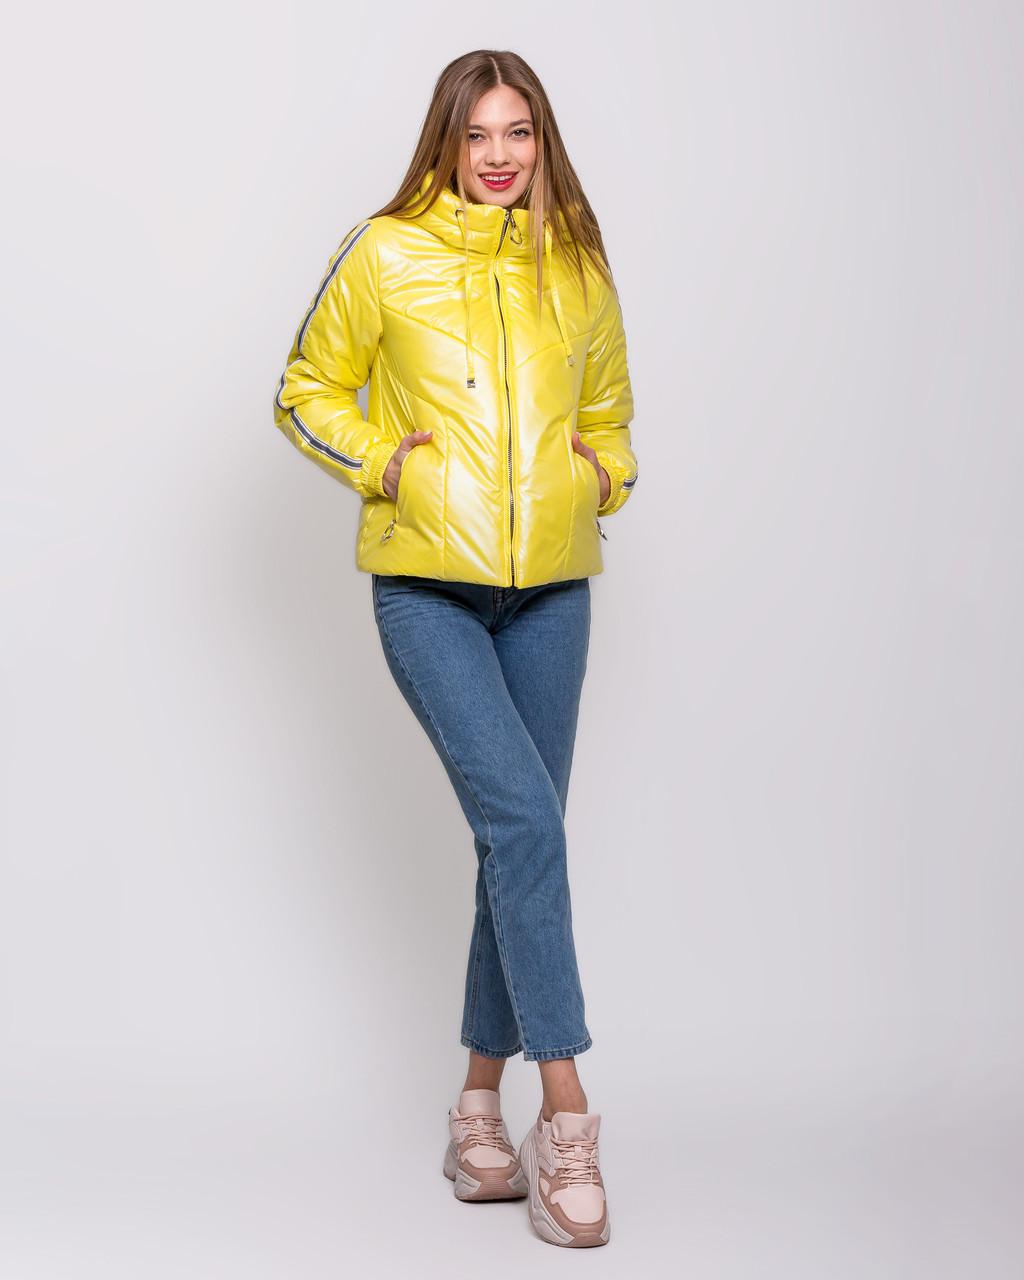 Модна куртка перламутр 42-54 Весна 2020